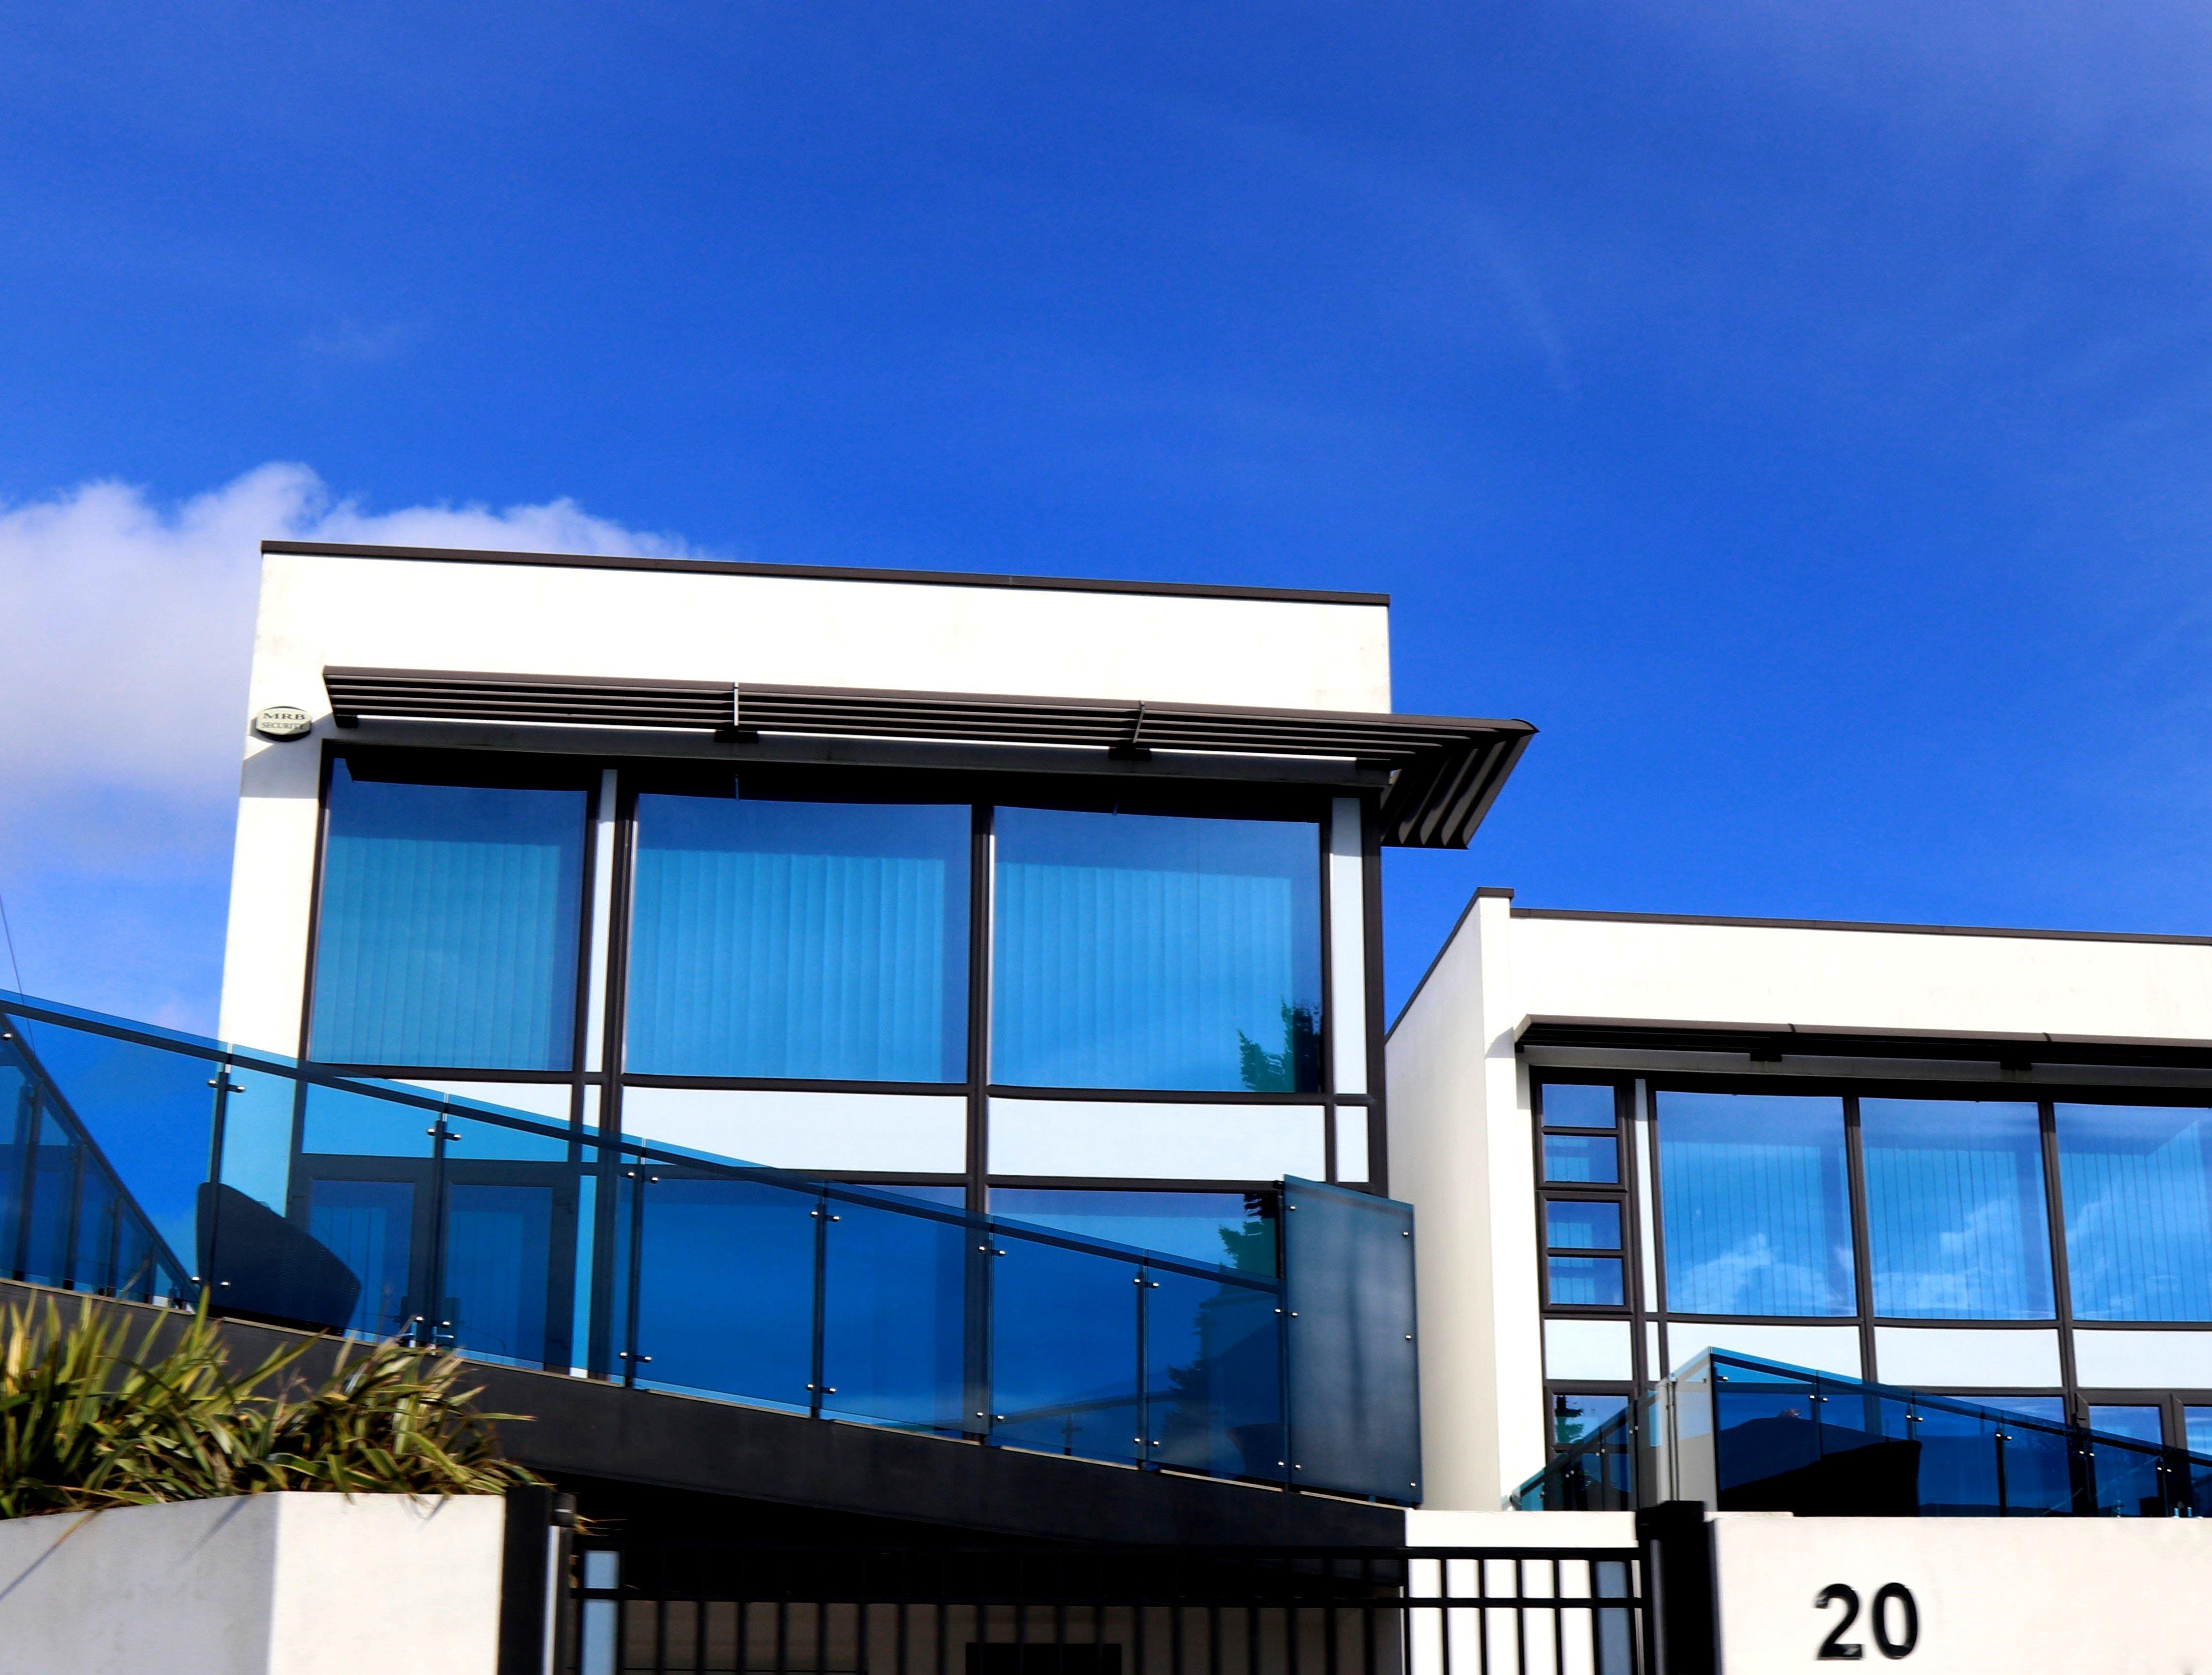 Free stock photo of house